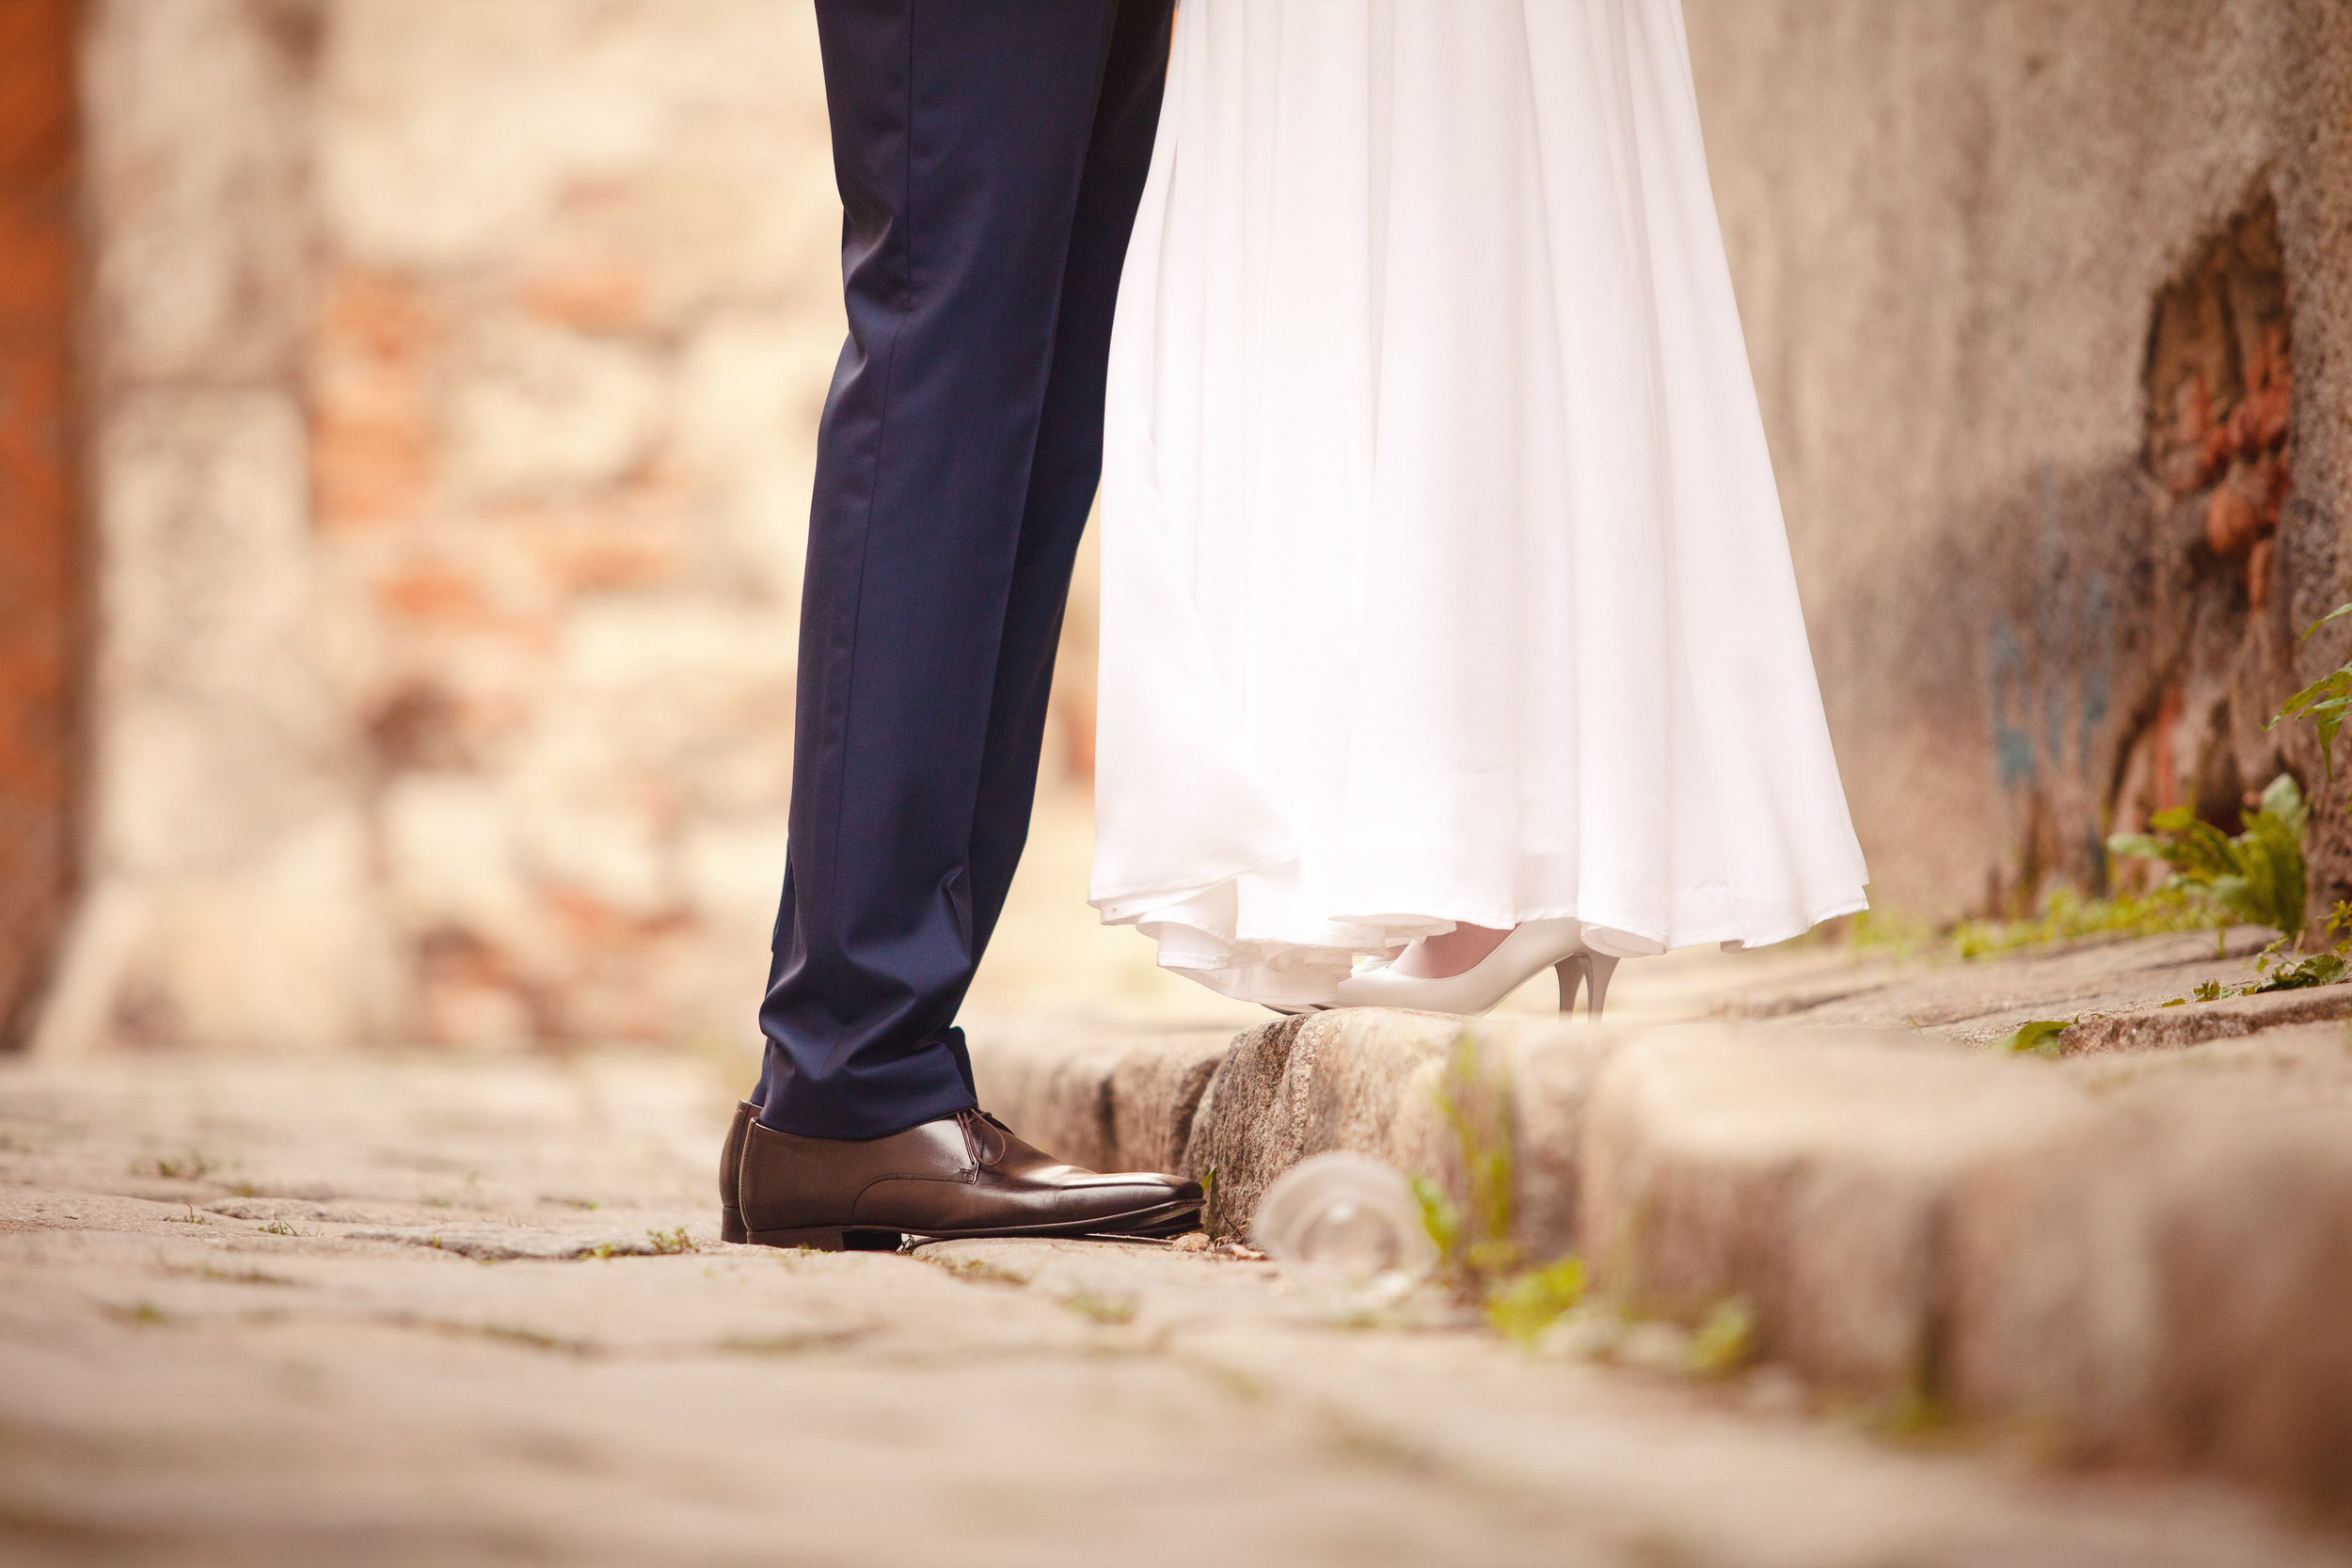 destination-wedding-photographer-bratislava-slovakia-europe-portrait-session-details.jpg